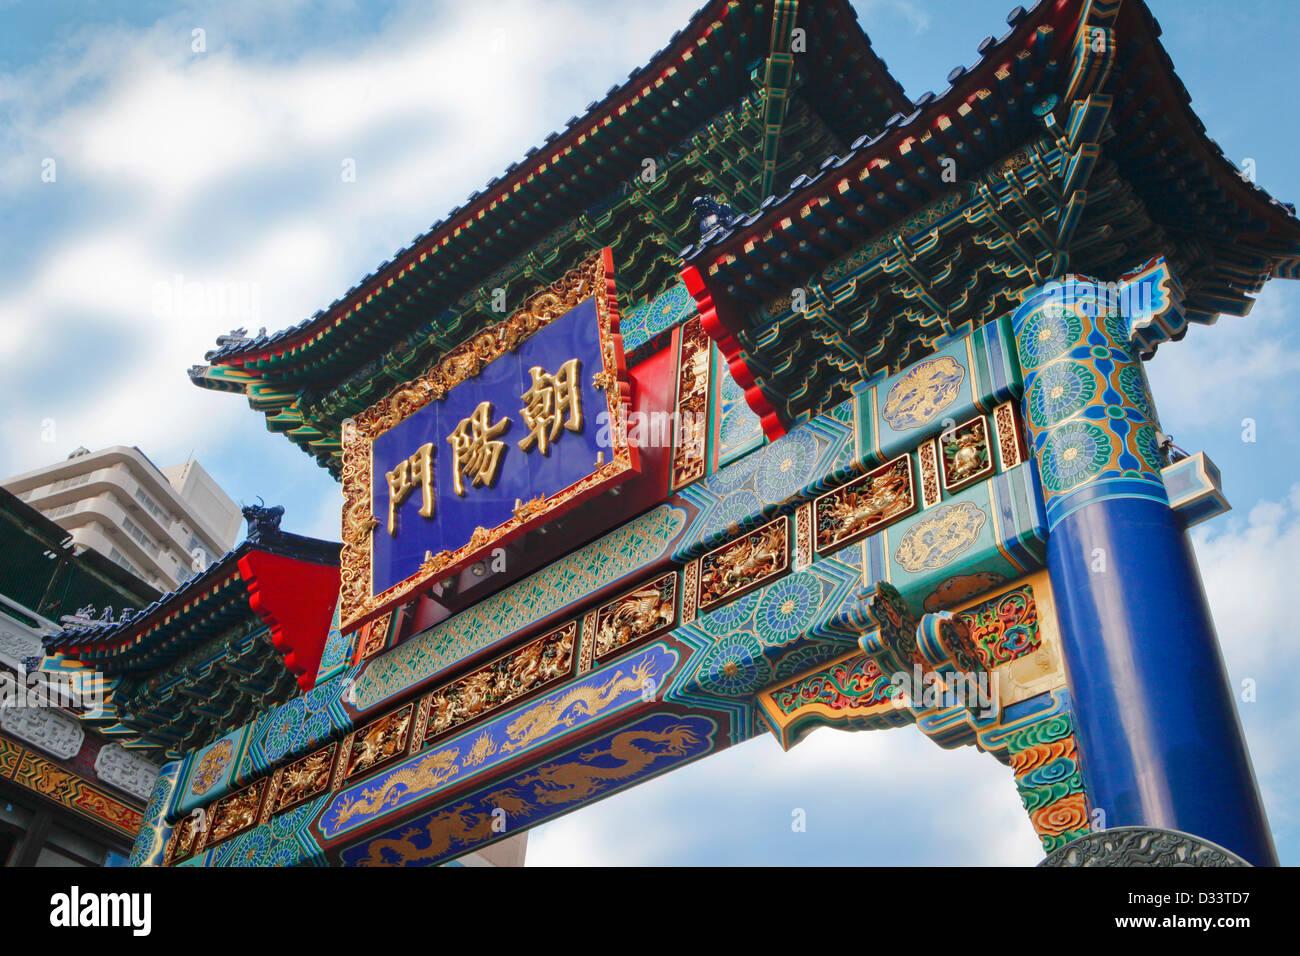 China town, Yokohama, Japan - Stock Image